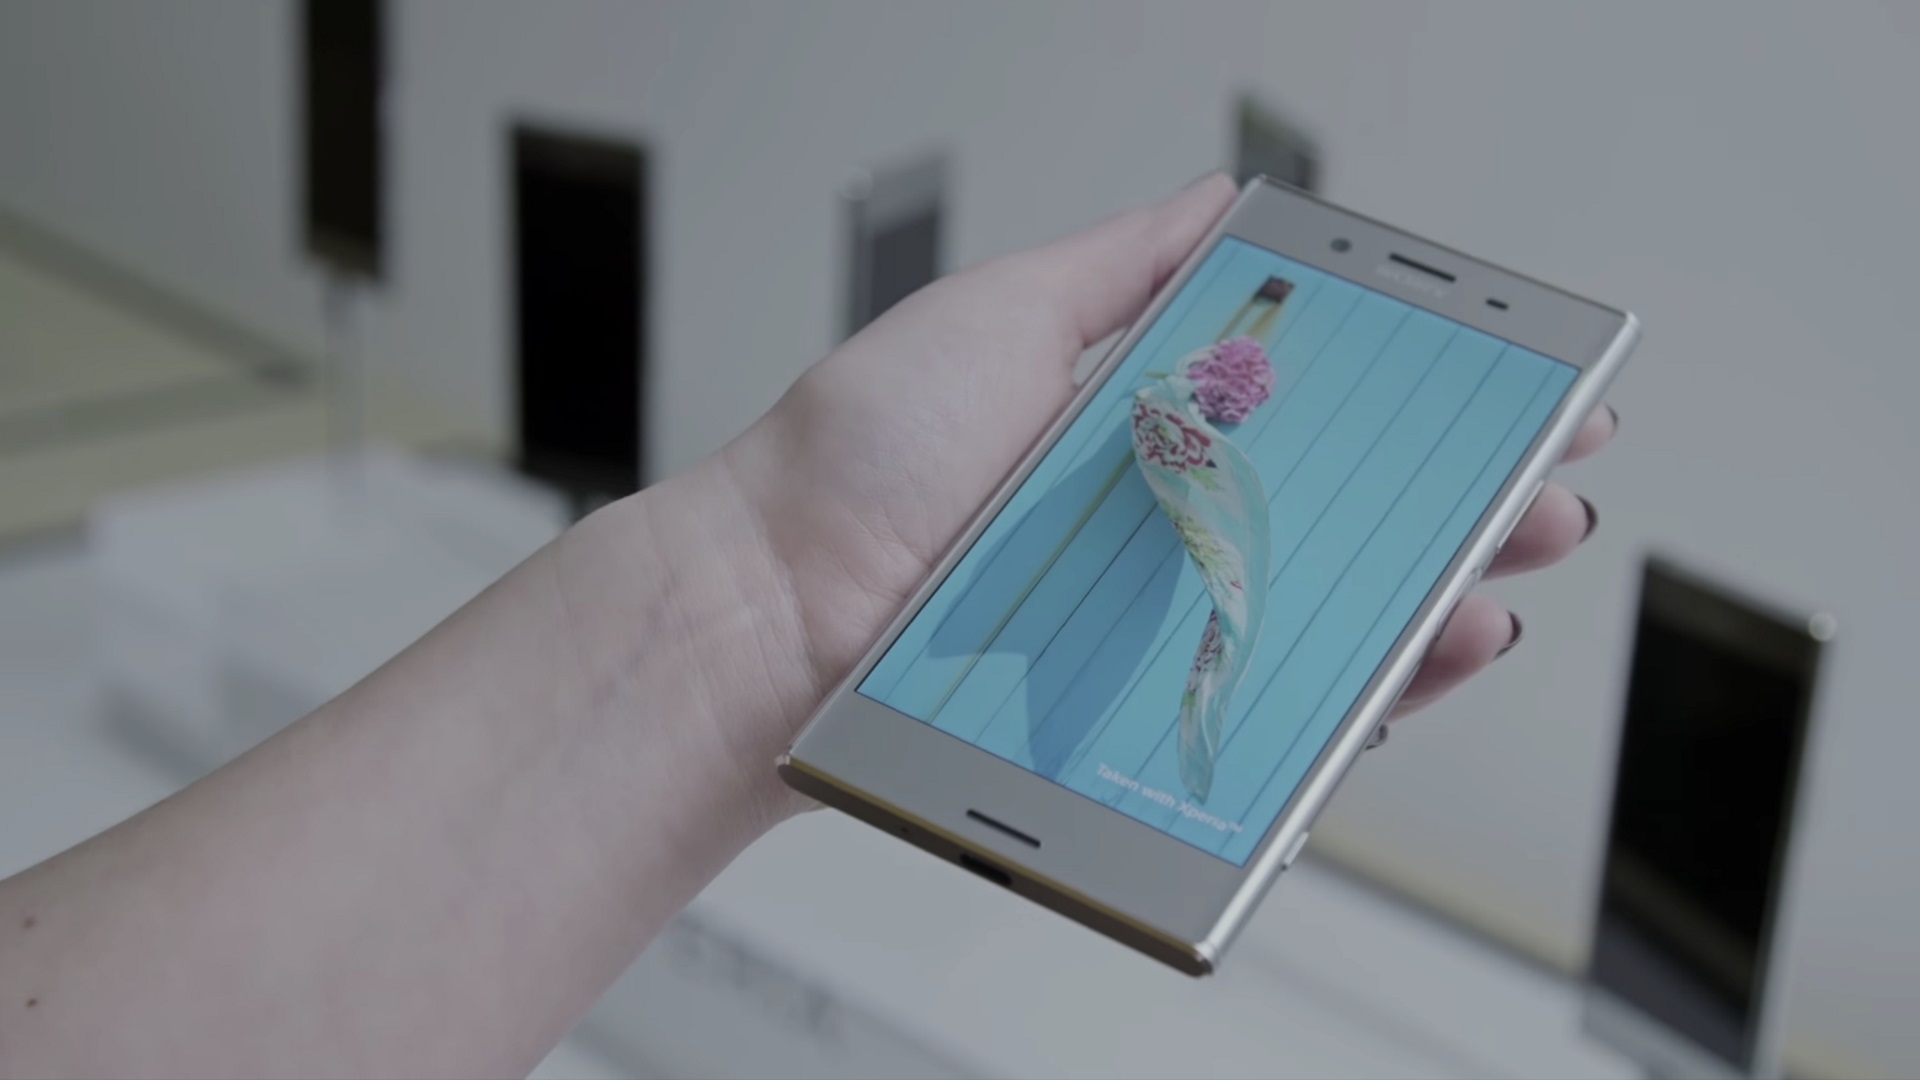 Sony Mobile、「Xperia XZ Premium」の公式ハンズオン動画を公開